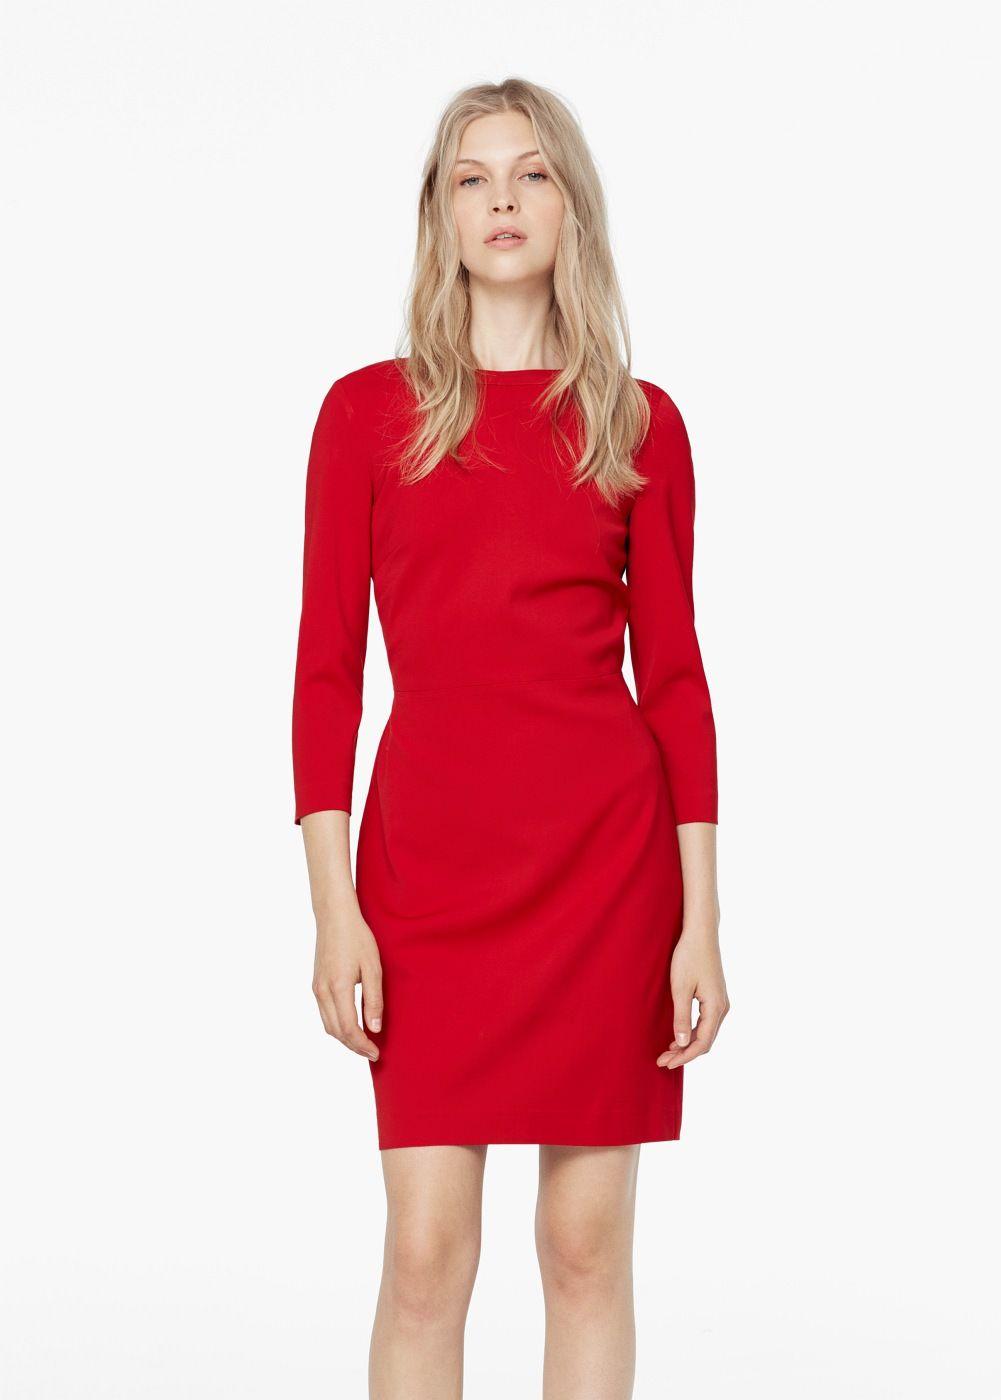 Vneckline fitted dress neckline dinner outfits and wardrobe basics